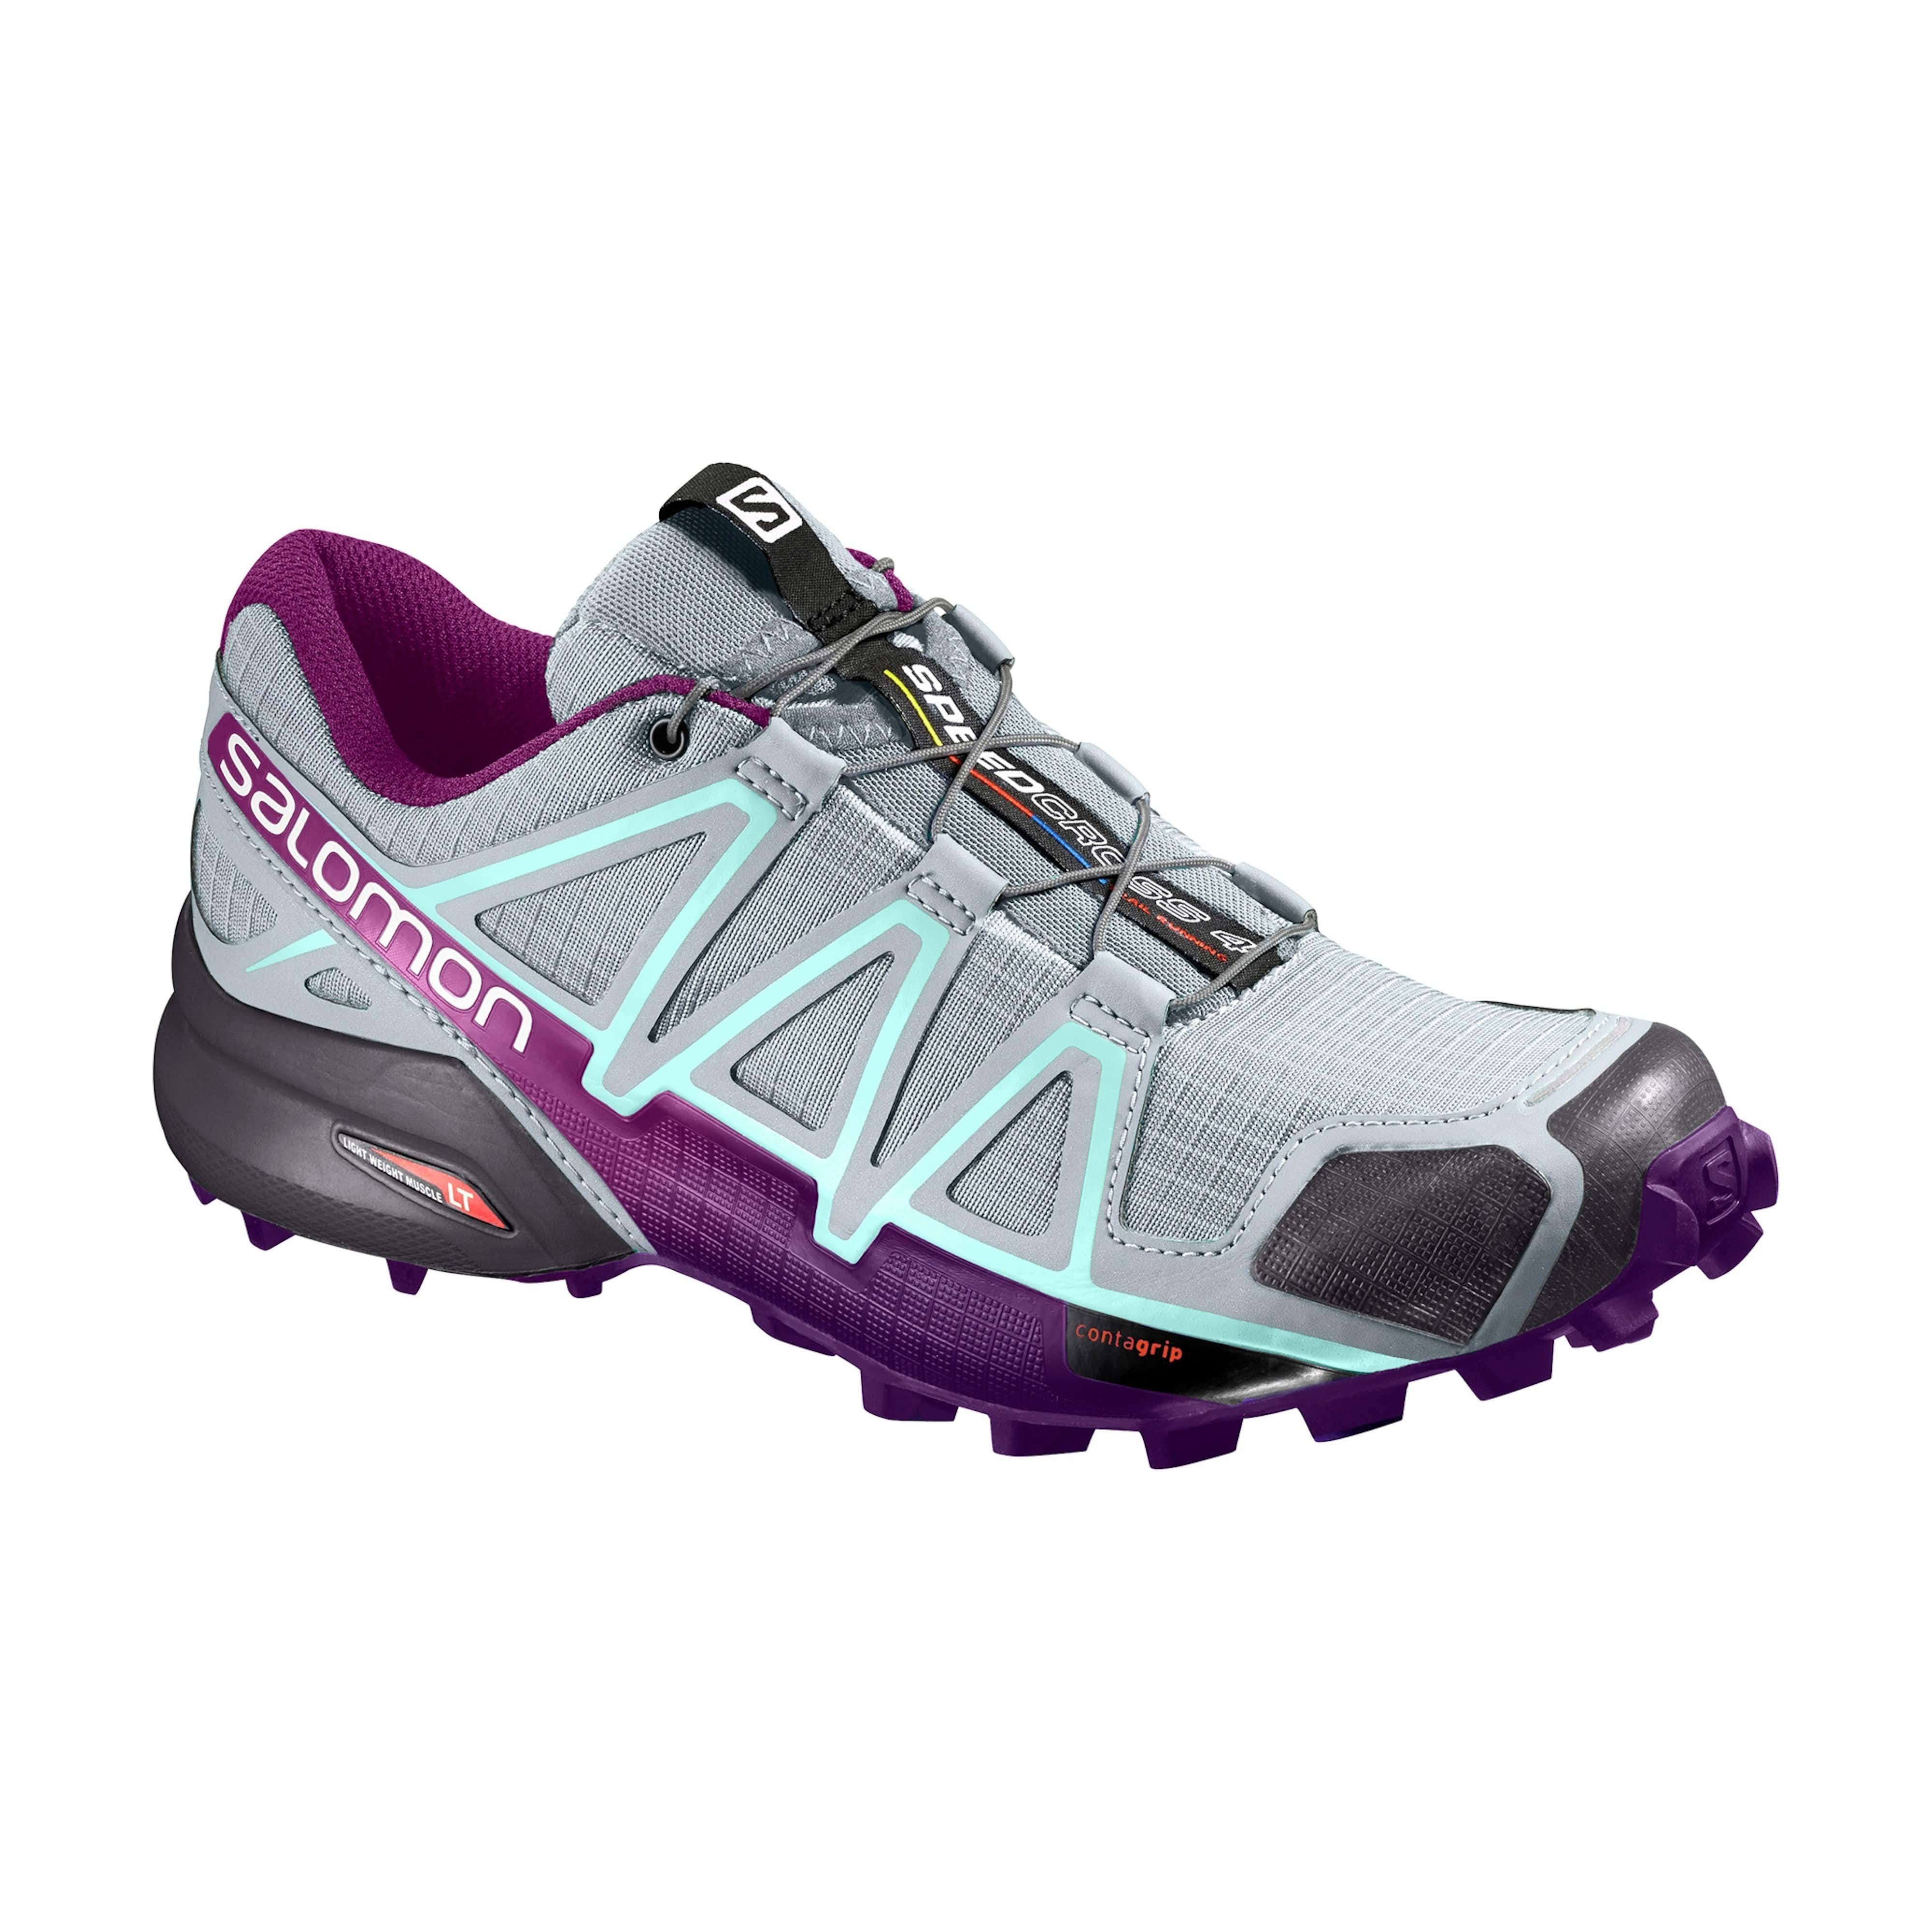 7671d14f4e47f Salomon Women s Trail Running Shoe Speedcross 4 - Exclusive Colour